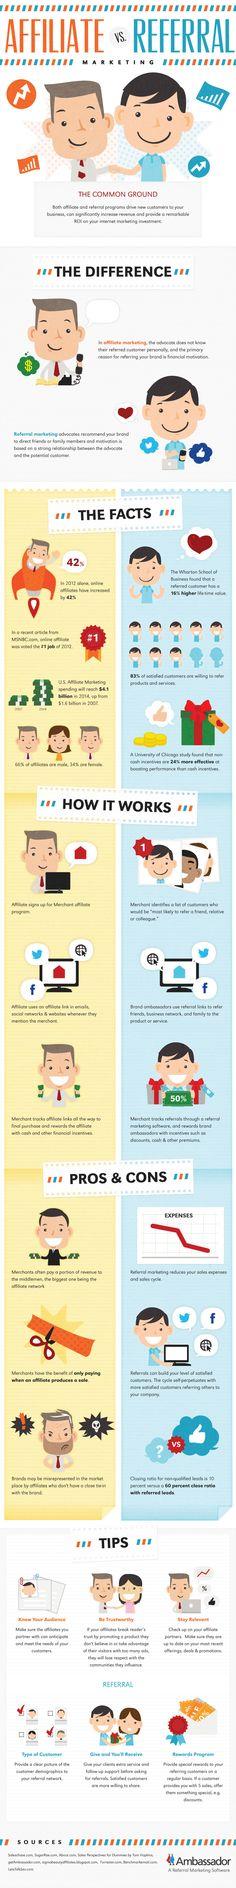 Affiliate Marketing vs. Referral Marketing